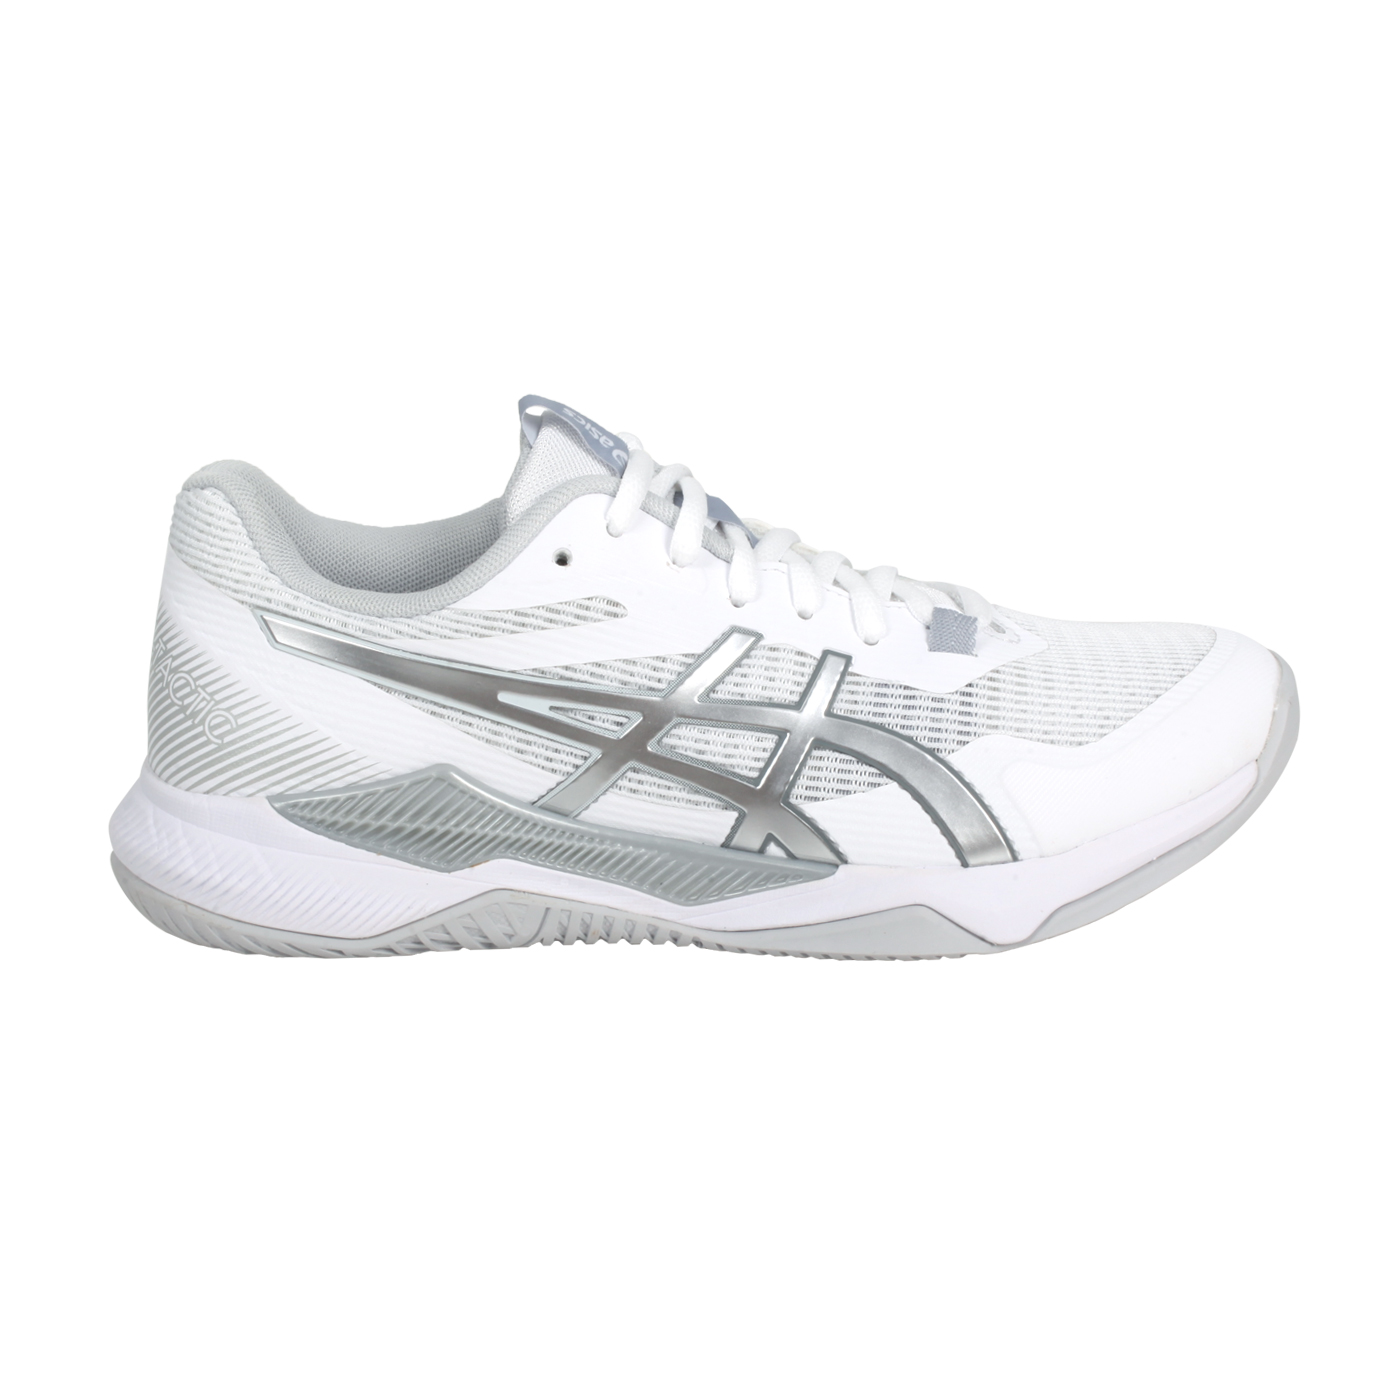 ASICS 女款排羽球鞋  @GEL-TACTIC@1072A070-101 - 白銀